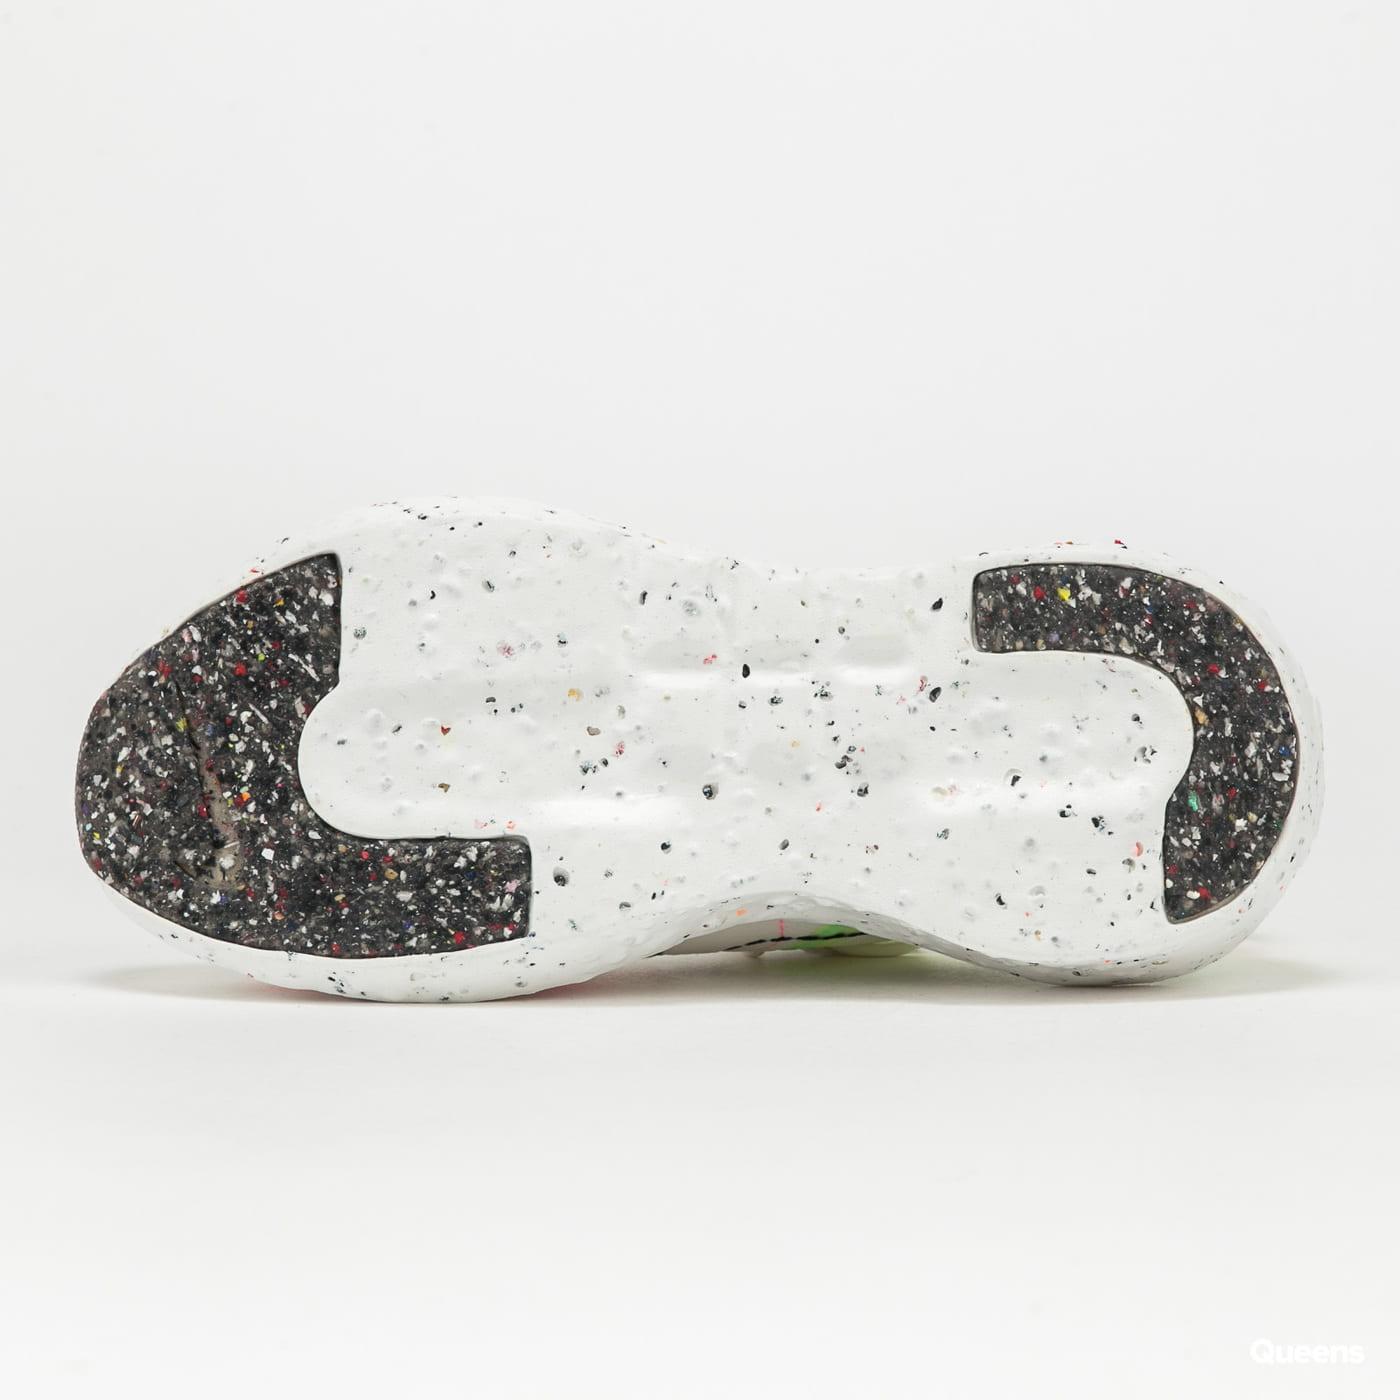 Nike W Crater Impact summit white / blck - green glow